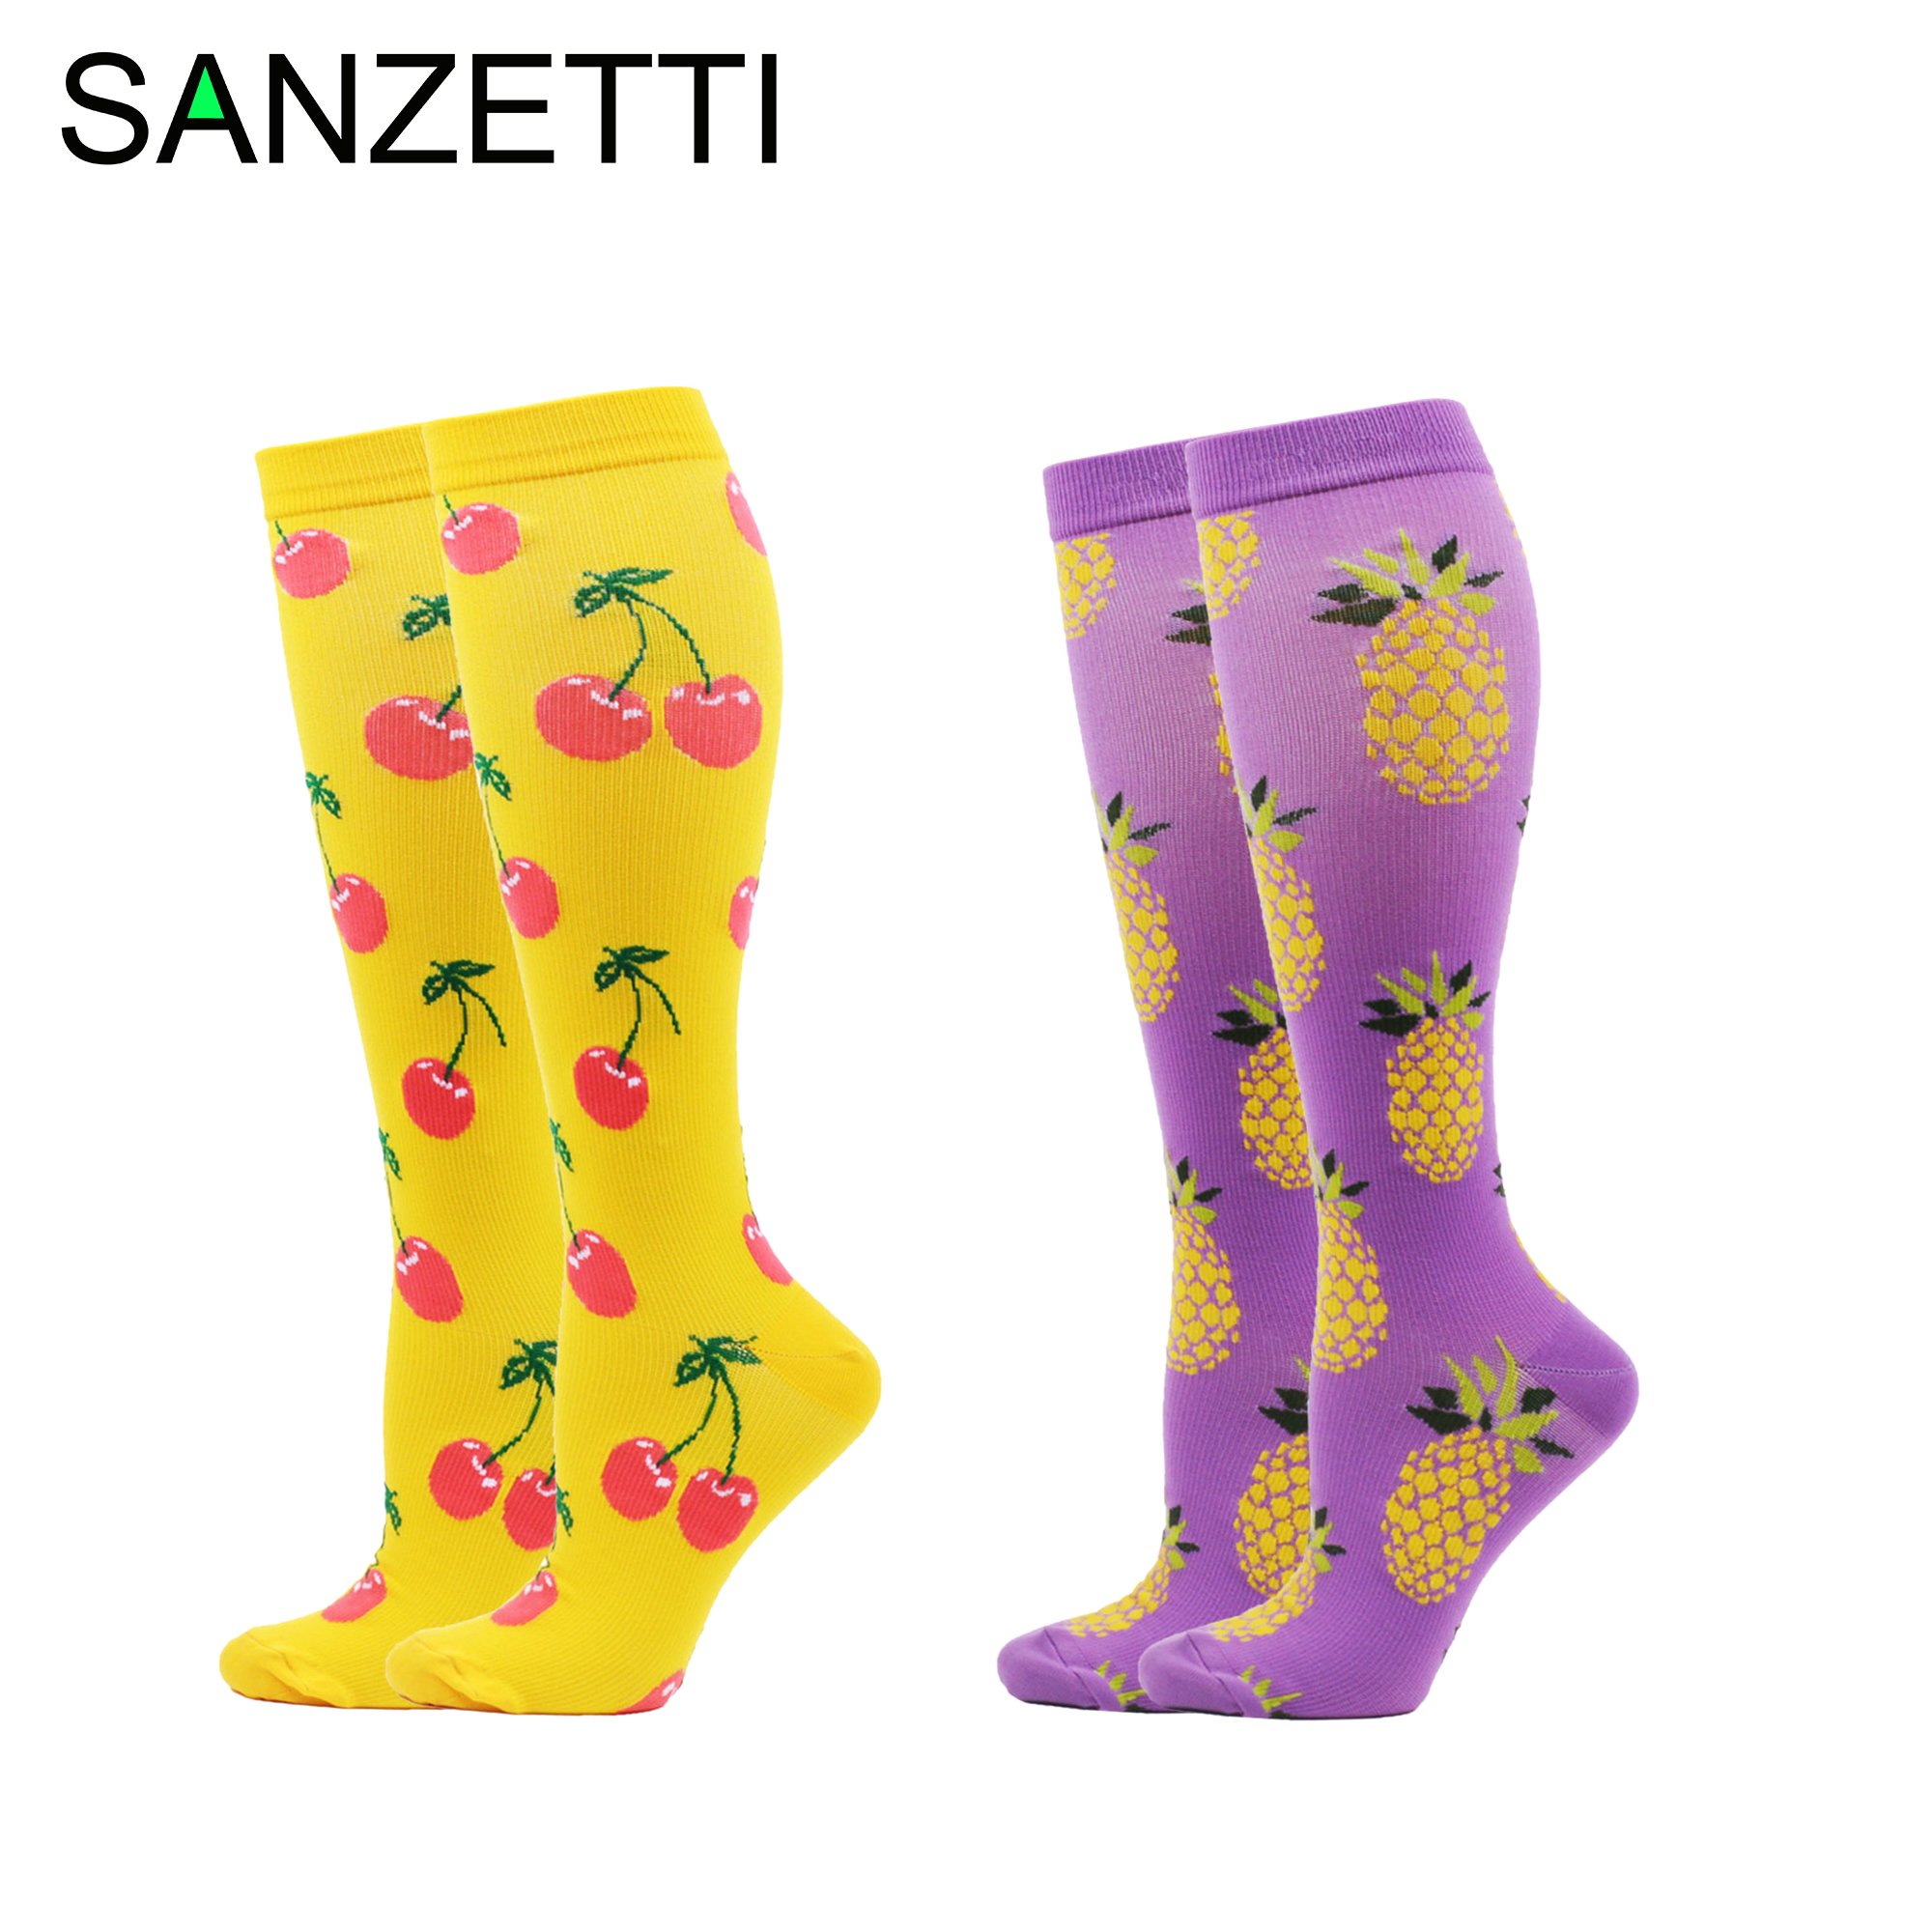 SANZETTI 2 Pairs Hot Women Leg Support Stretch Combed Cotton Compression Socks Cherry Below Knee Anti-Fatigue Long Happy Socks